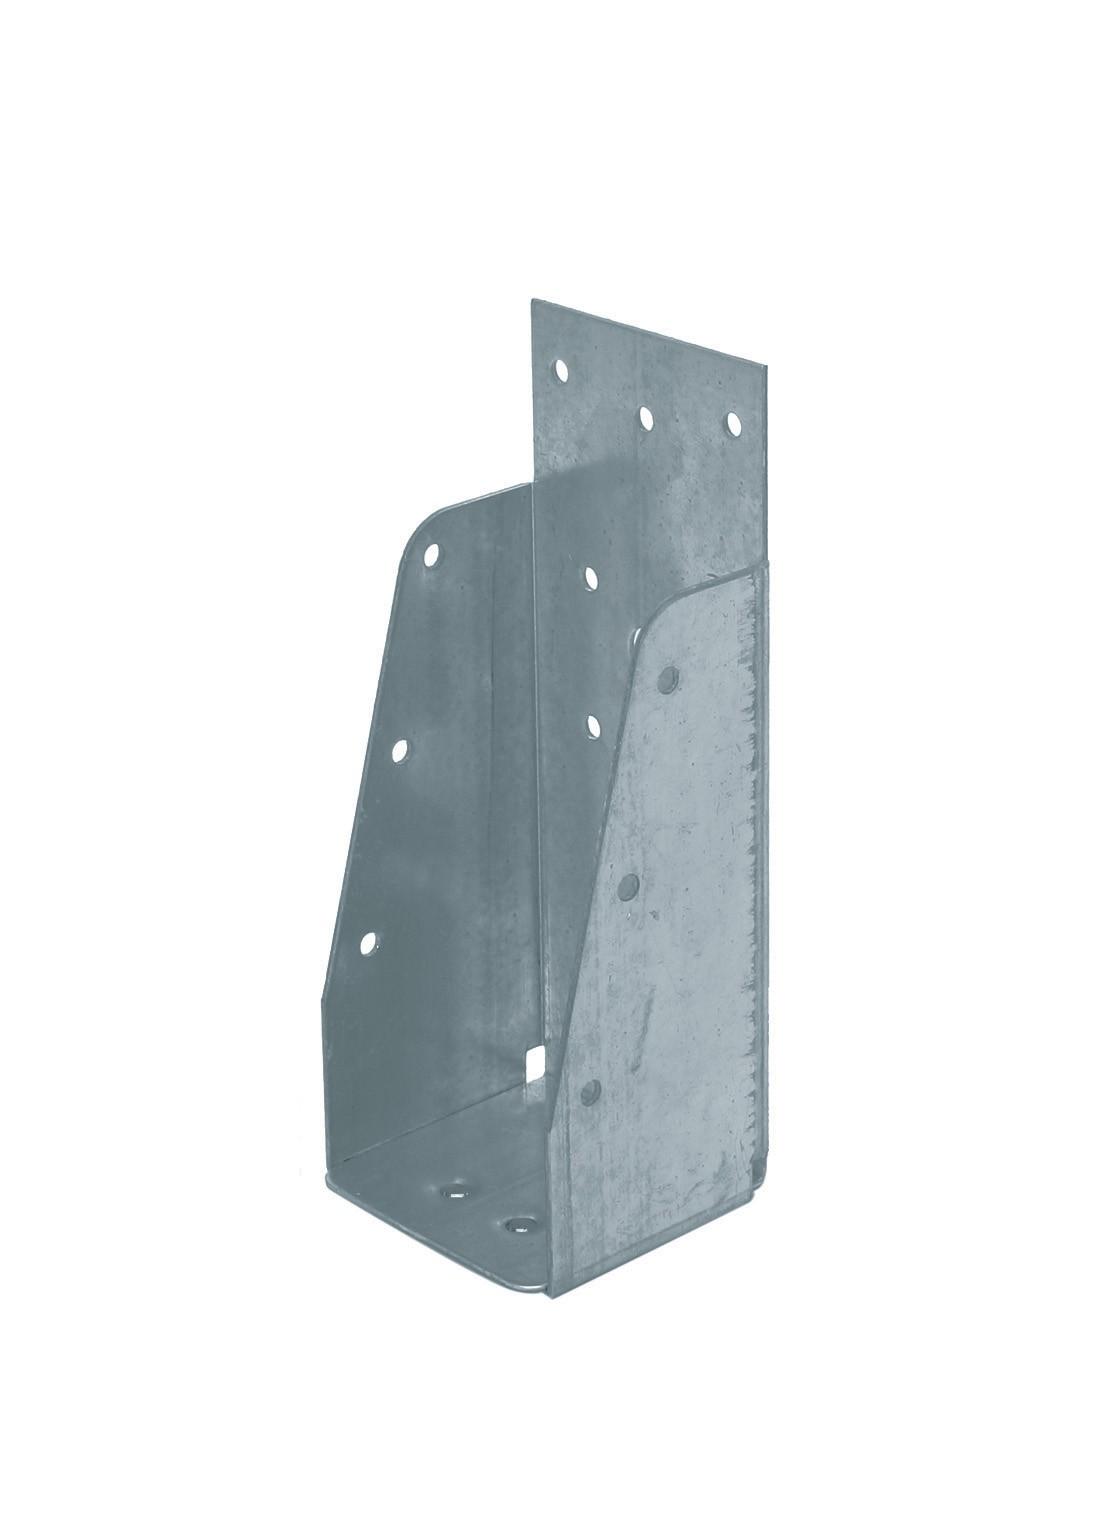 Balkdrager GBS-ZL 50x200 1,5 SV